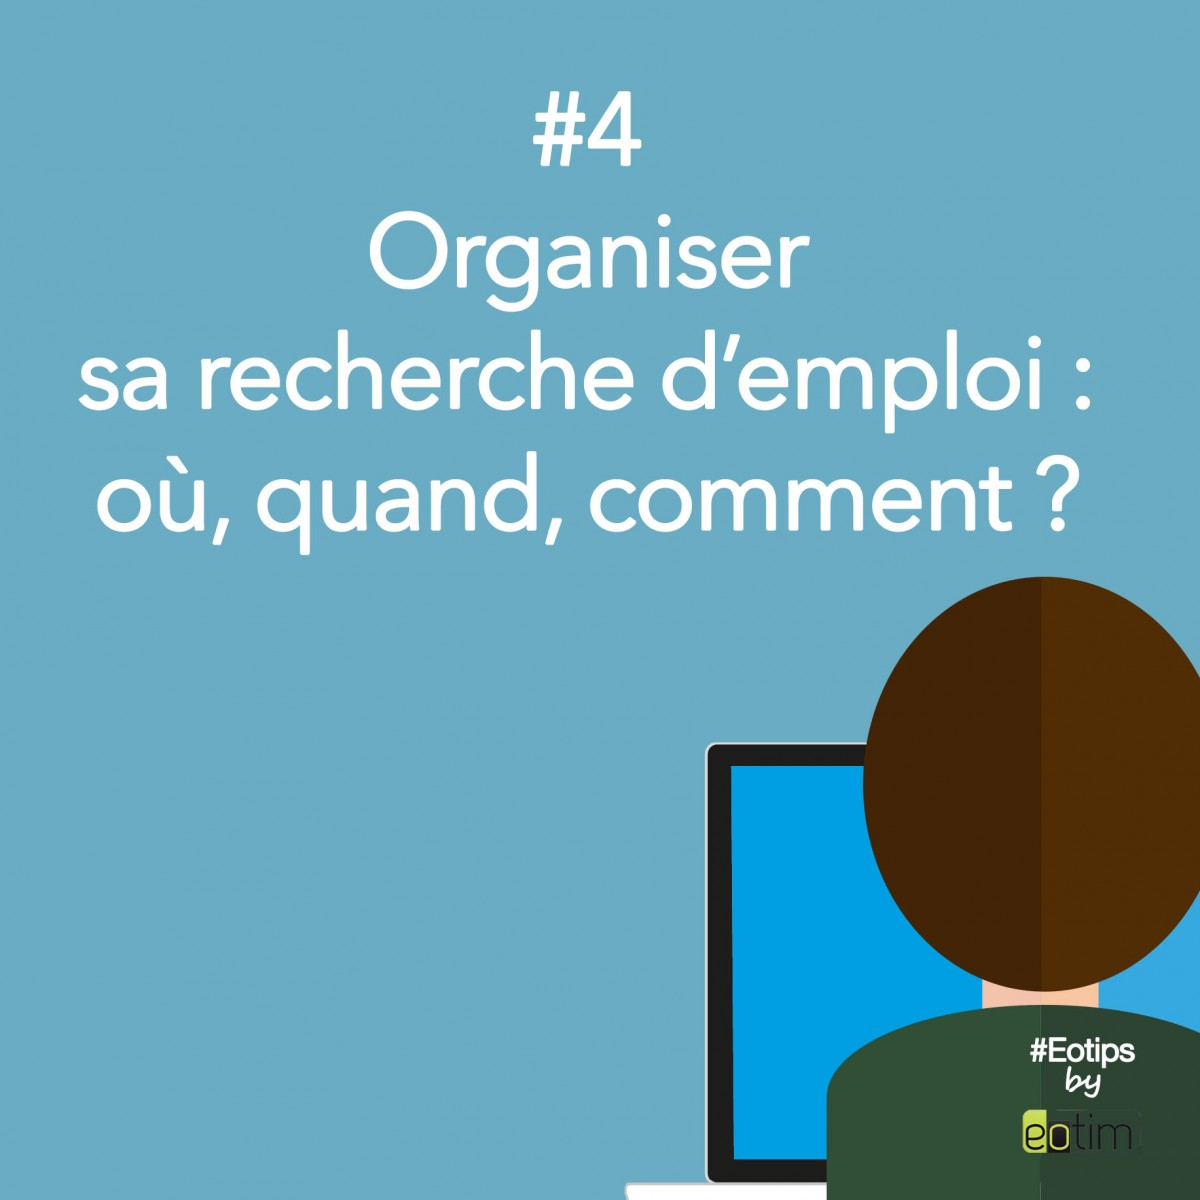 Eotips #4 : Organiser sa recherche d'emploi : où, quand, comment ?